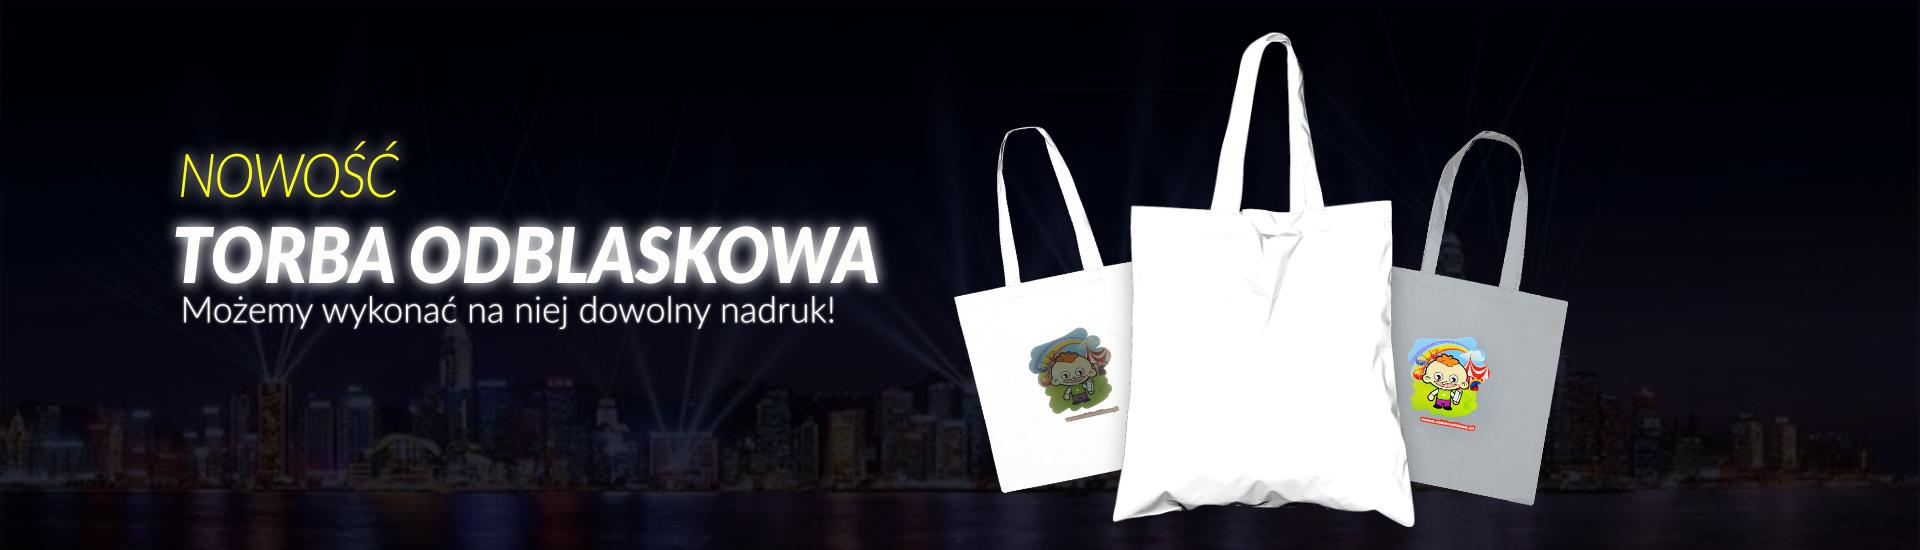 torba odblaskowa